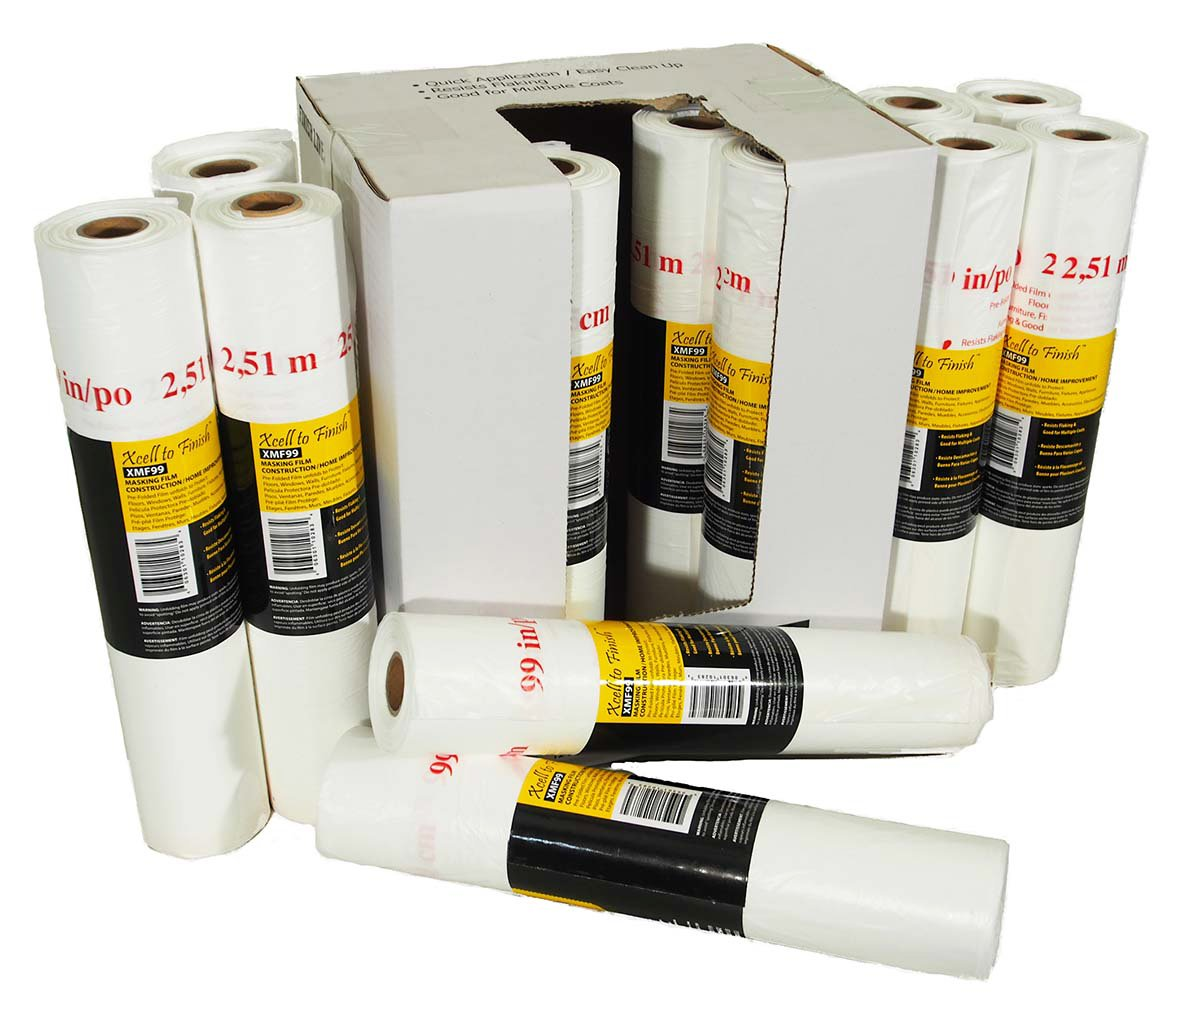 Reli. Pre-Folded Masking Film, 12 Rolls Wholesale Case (90 Foot Length x 99 inch Width)